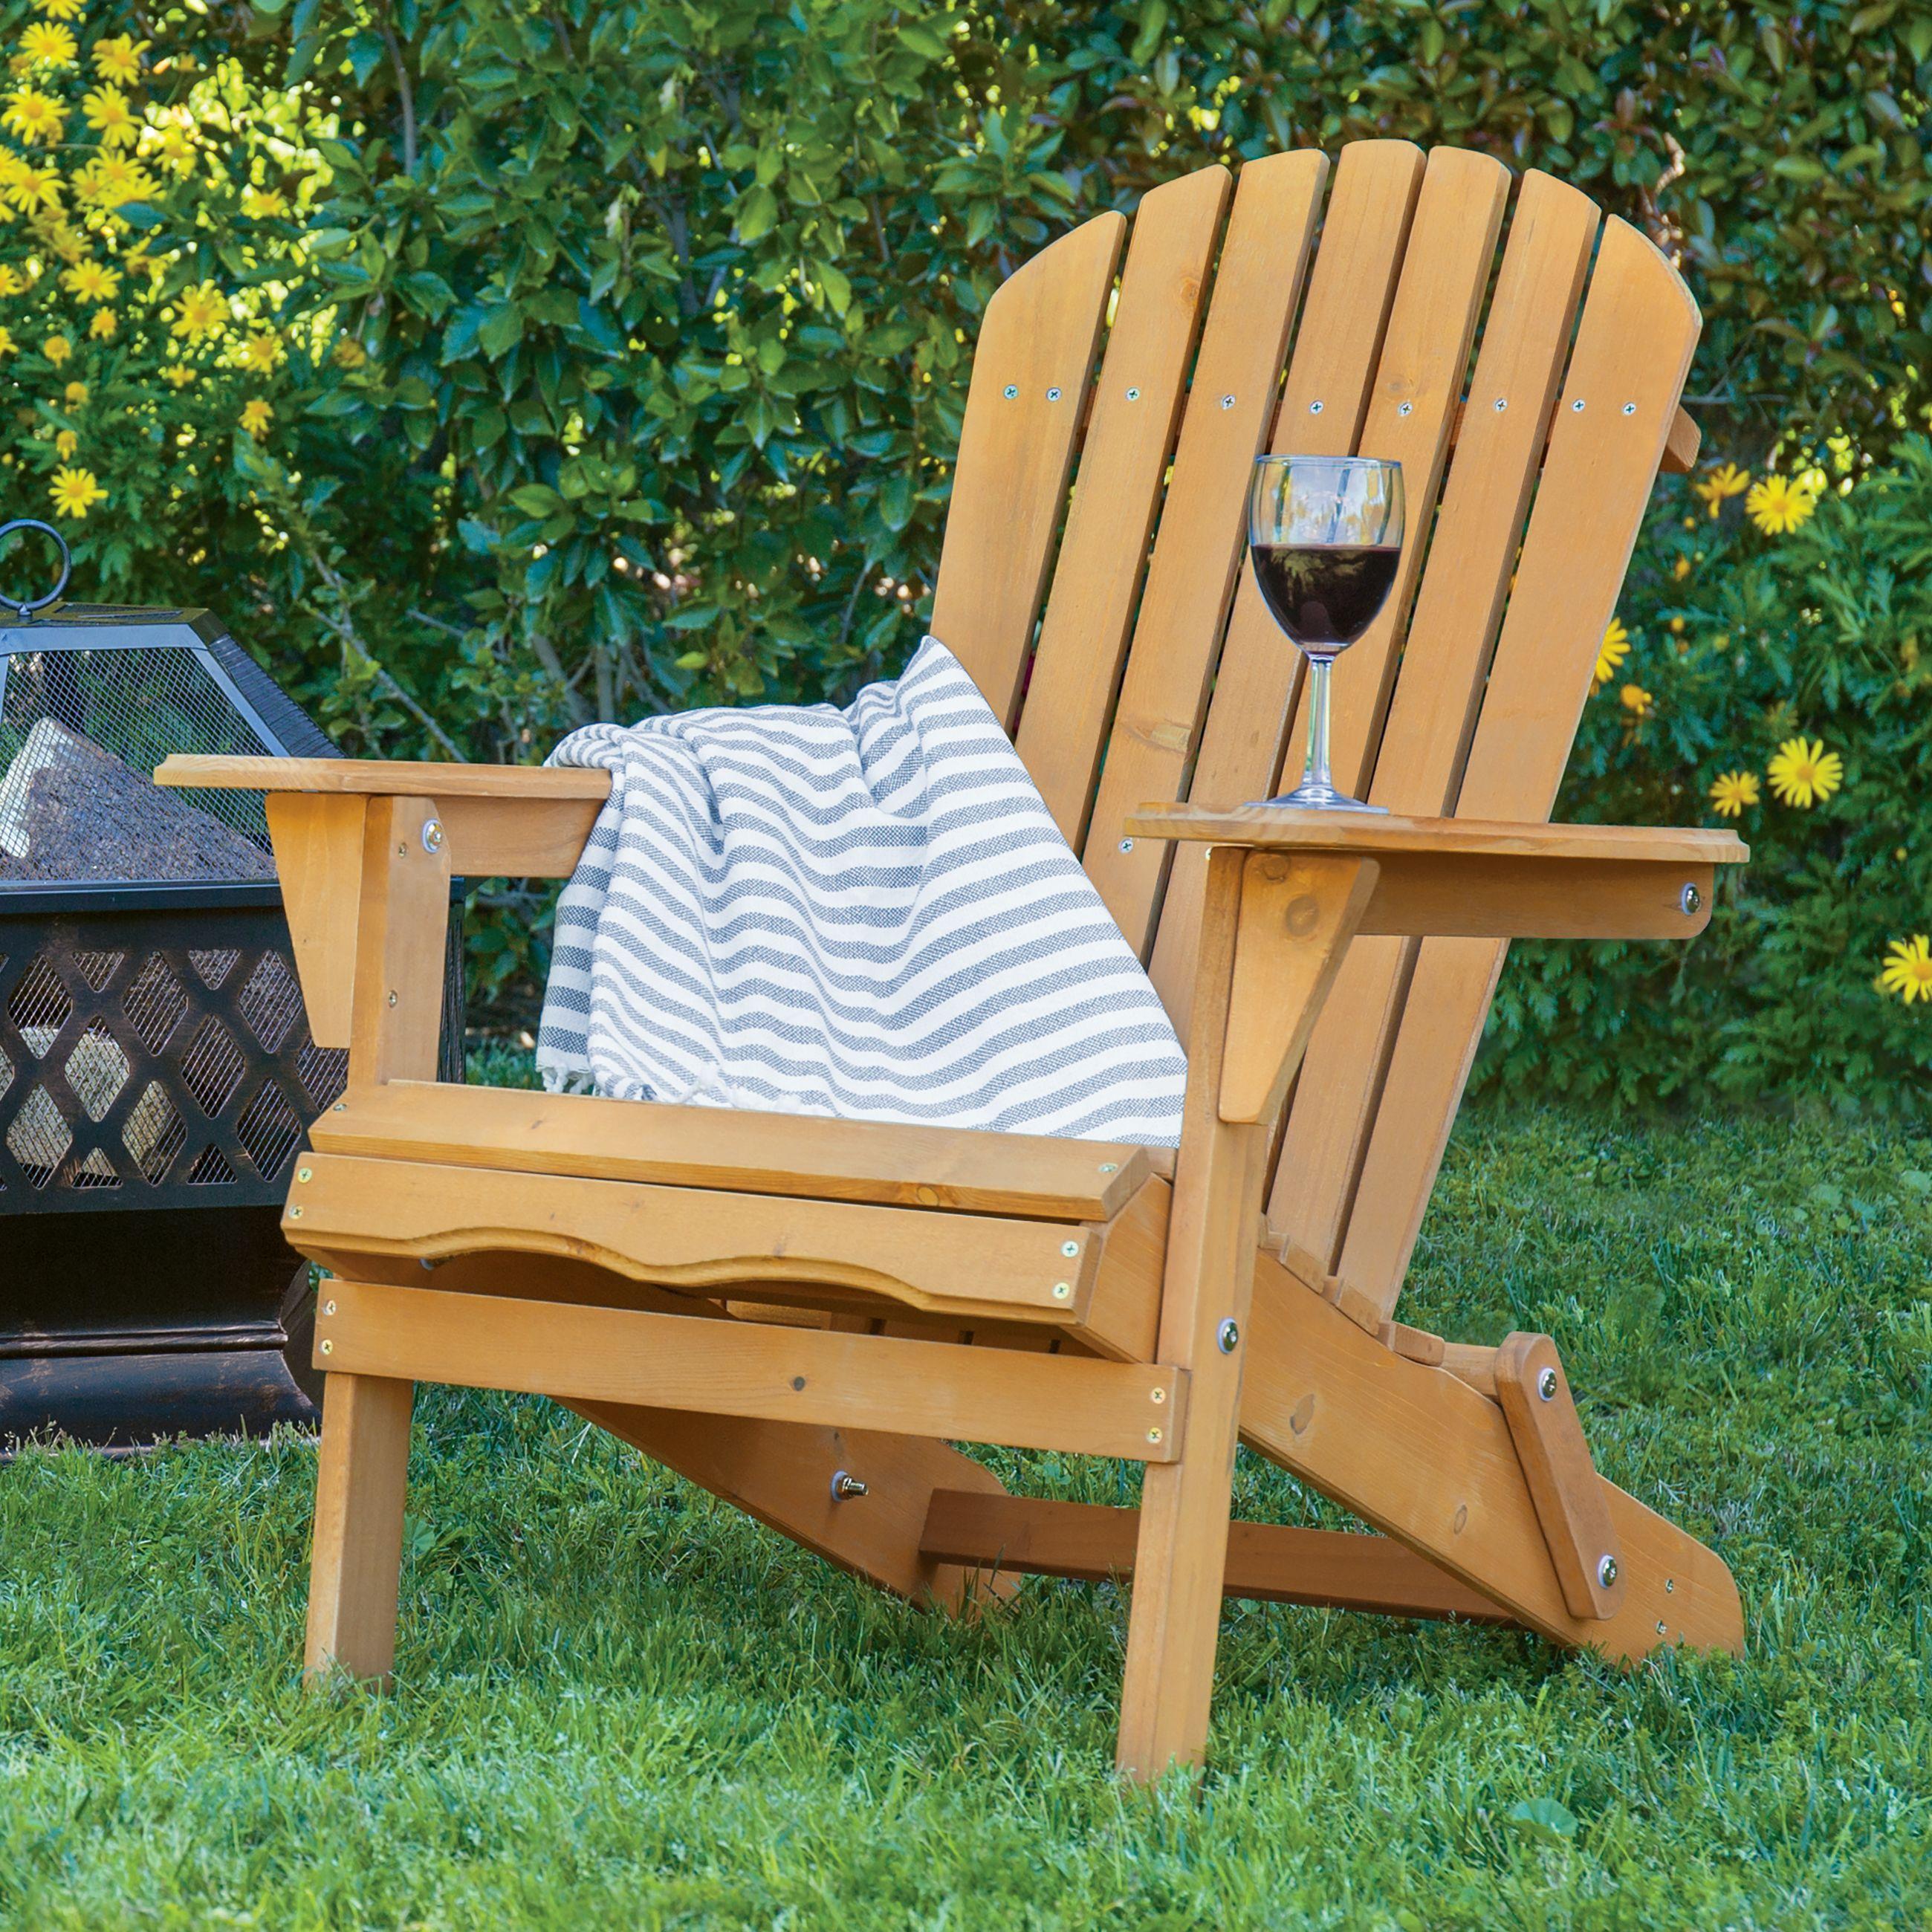 Realcomfort Adirondack Chair Wood Foldable Patio Outdoor Garden Furniture  Pool Description Realcomfort Adirondack Chair Wood Best